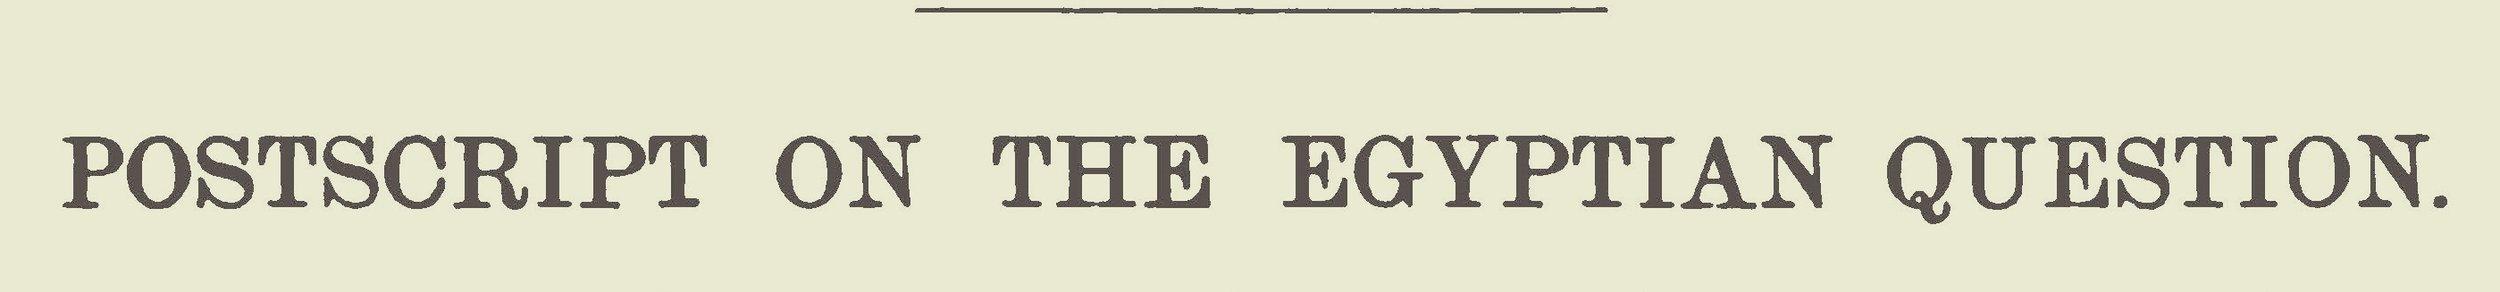 Lansing, Gulian, Postscript on the Egyptian Question Title Page.jpg